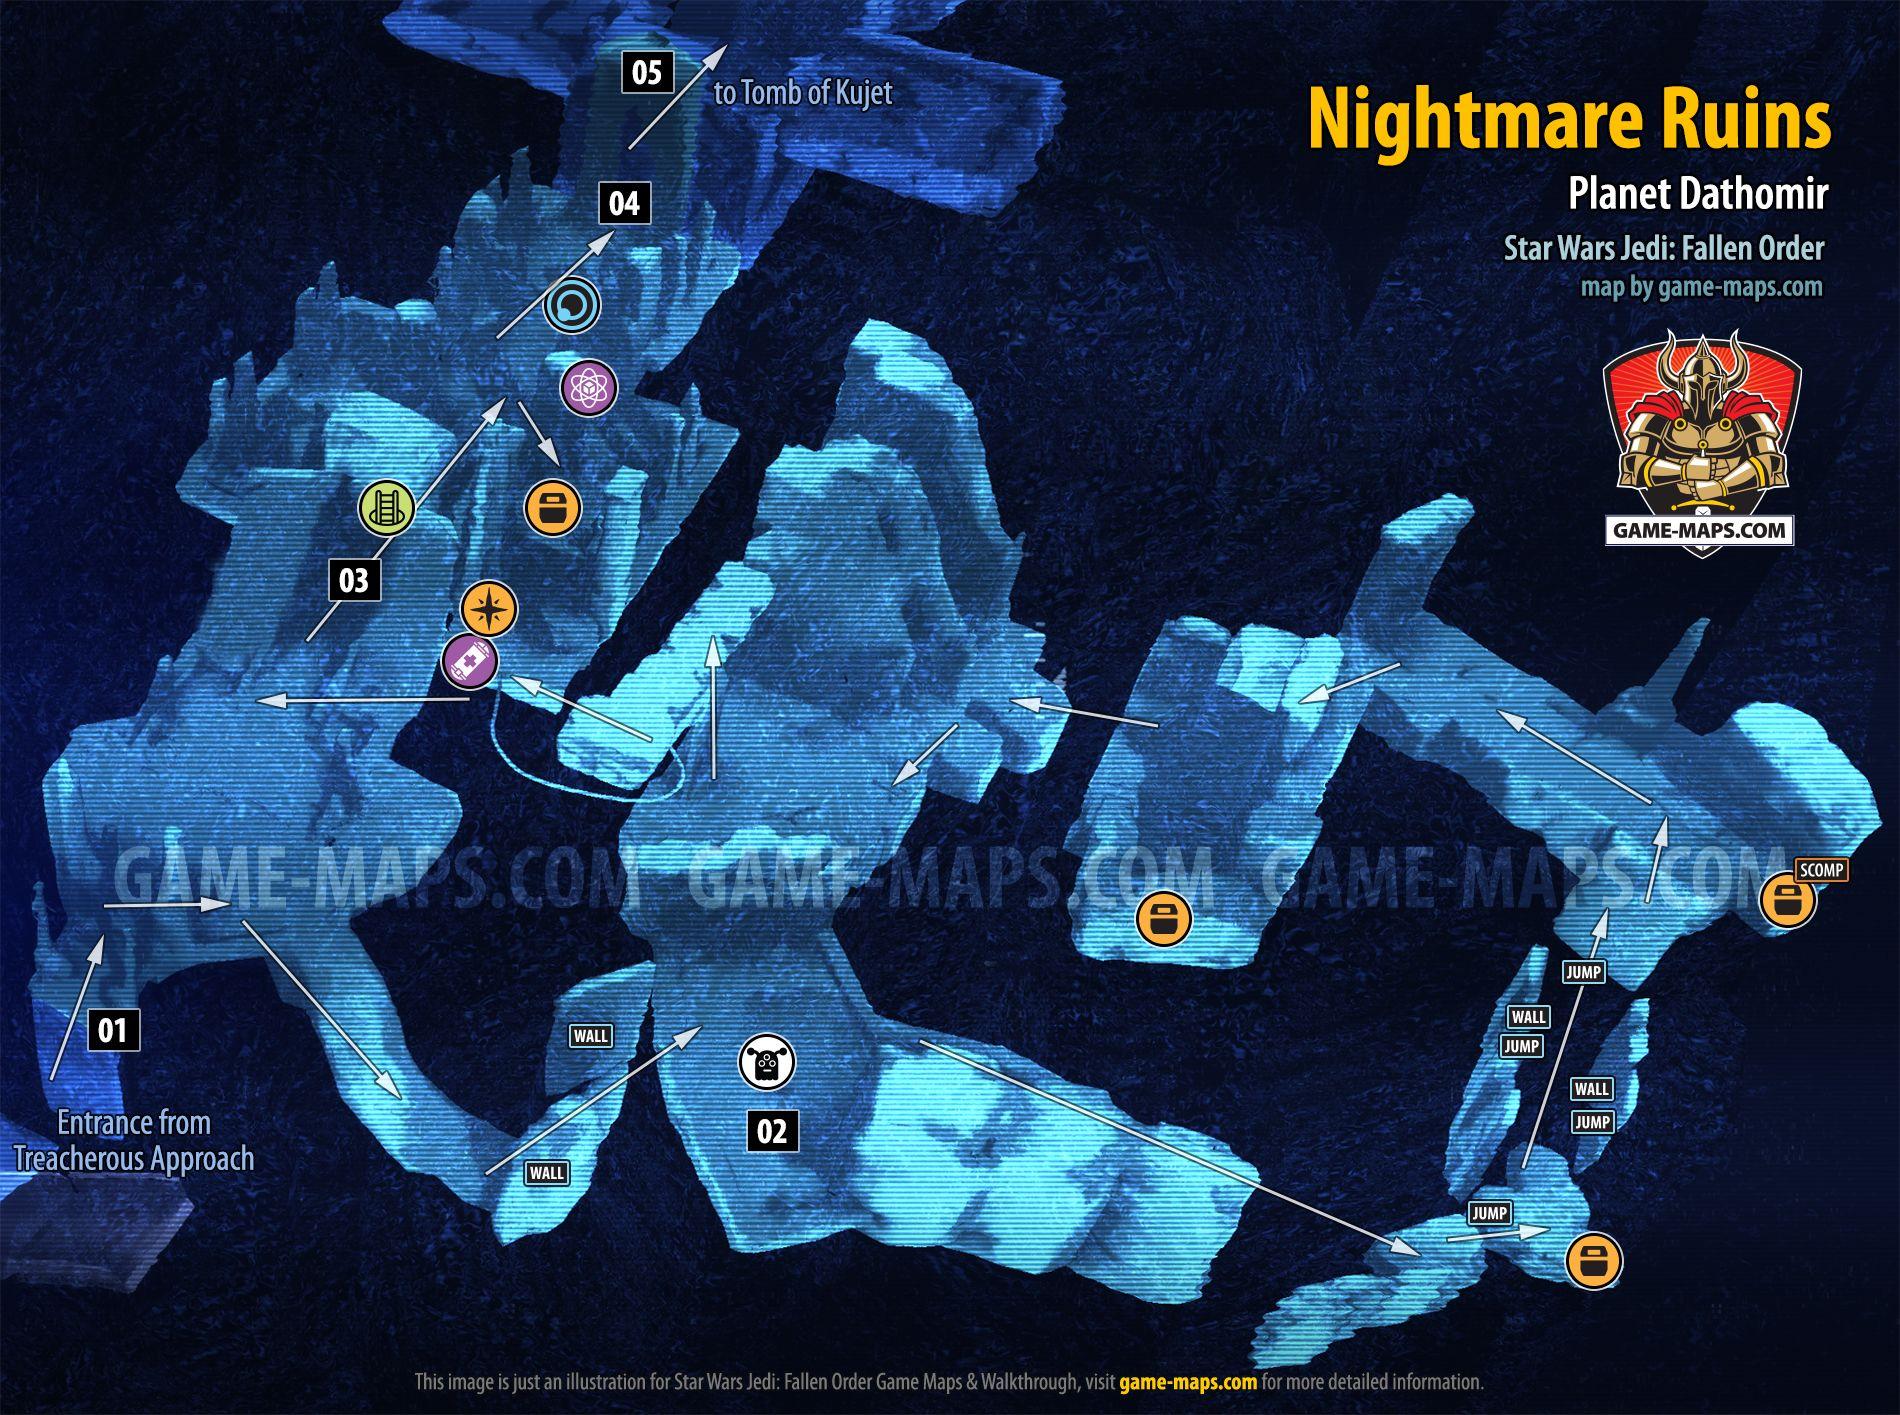 Nightmare Ruins Map Dathomir For Star Wars Jedi Fallen